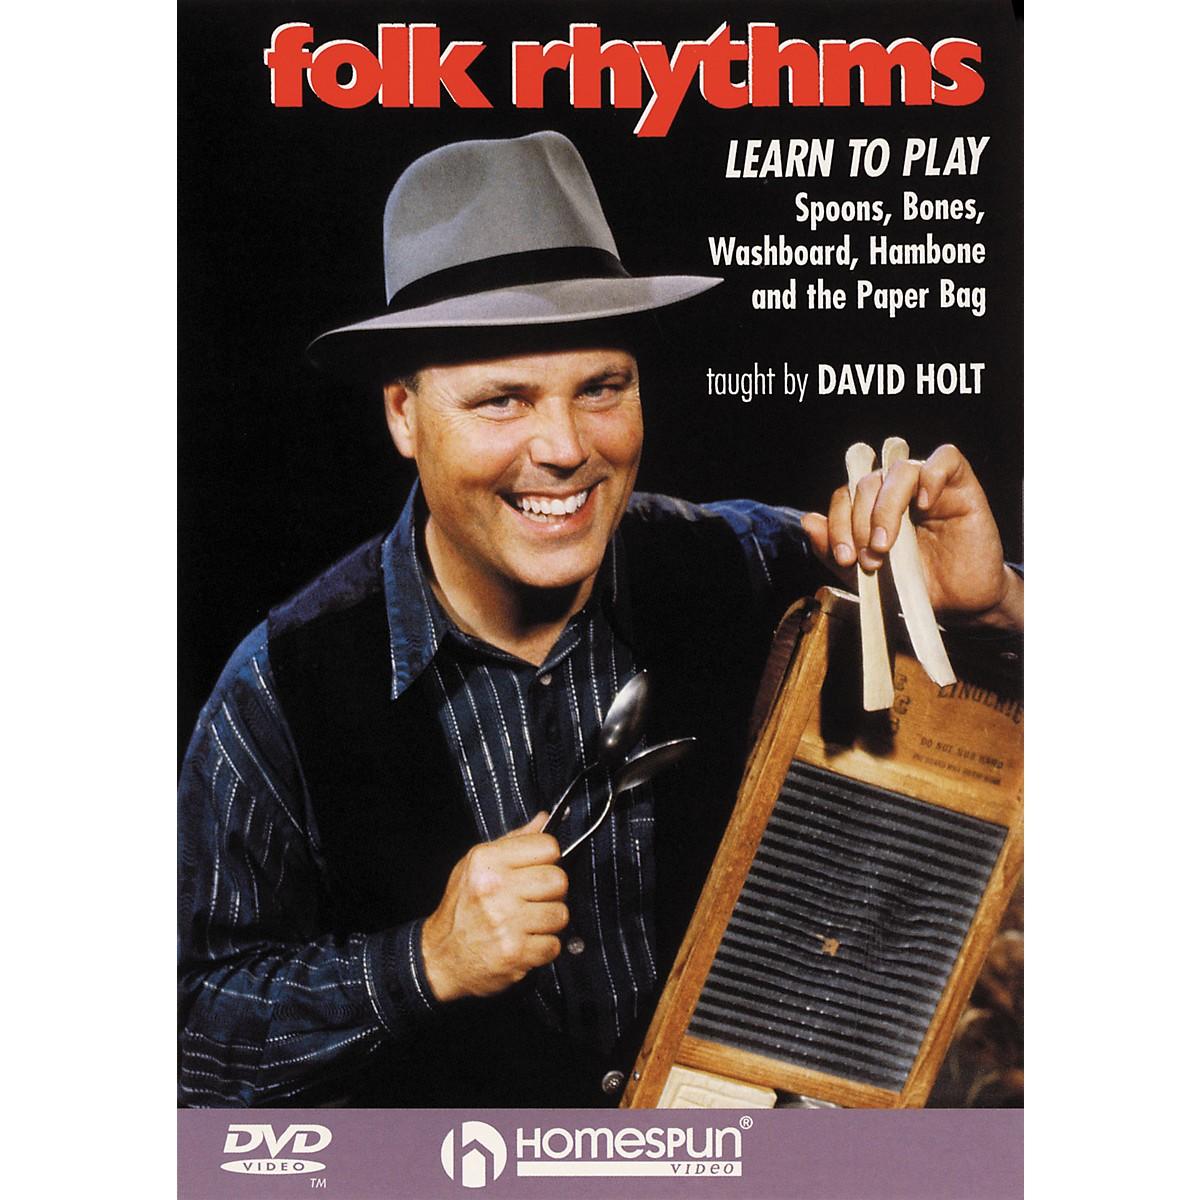 Homespun Folk Rhythms: Learn To Play Spoons, Bones, Washboard, Hambone and the Paper Bag (DVD)